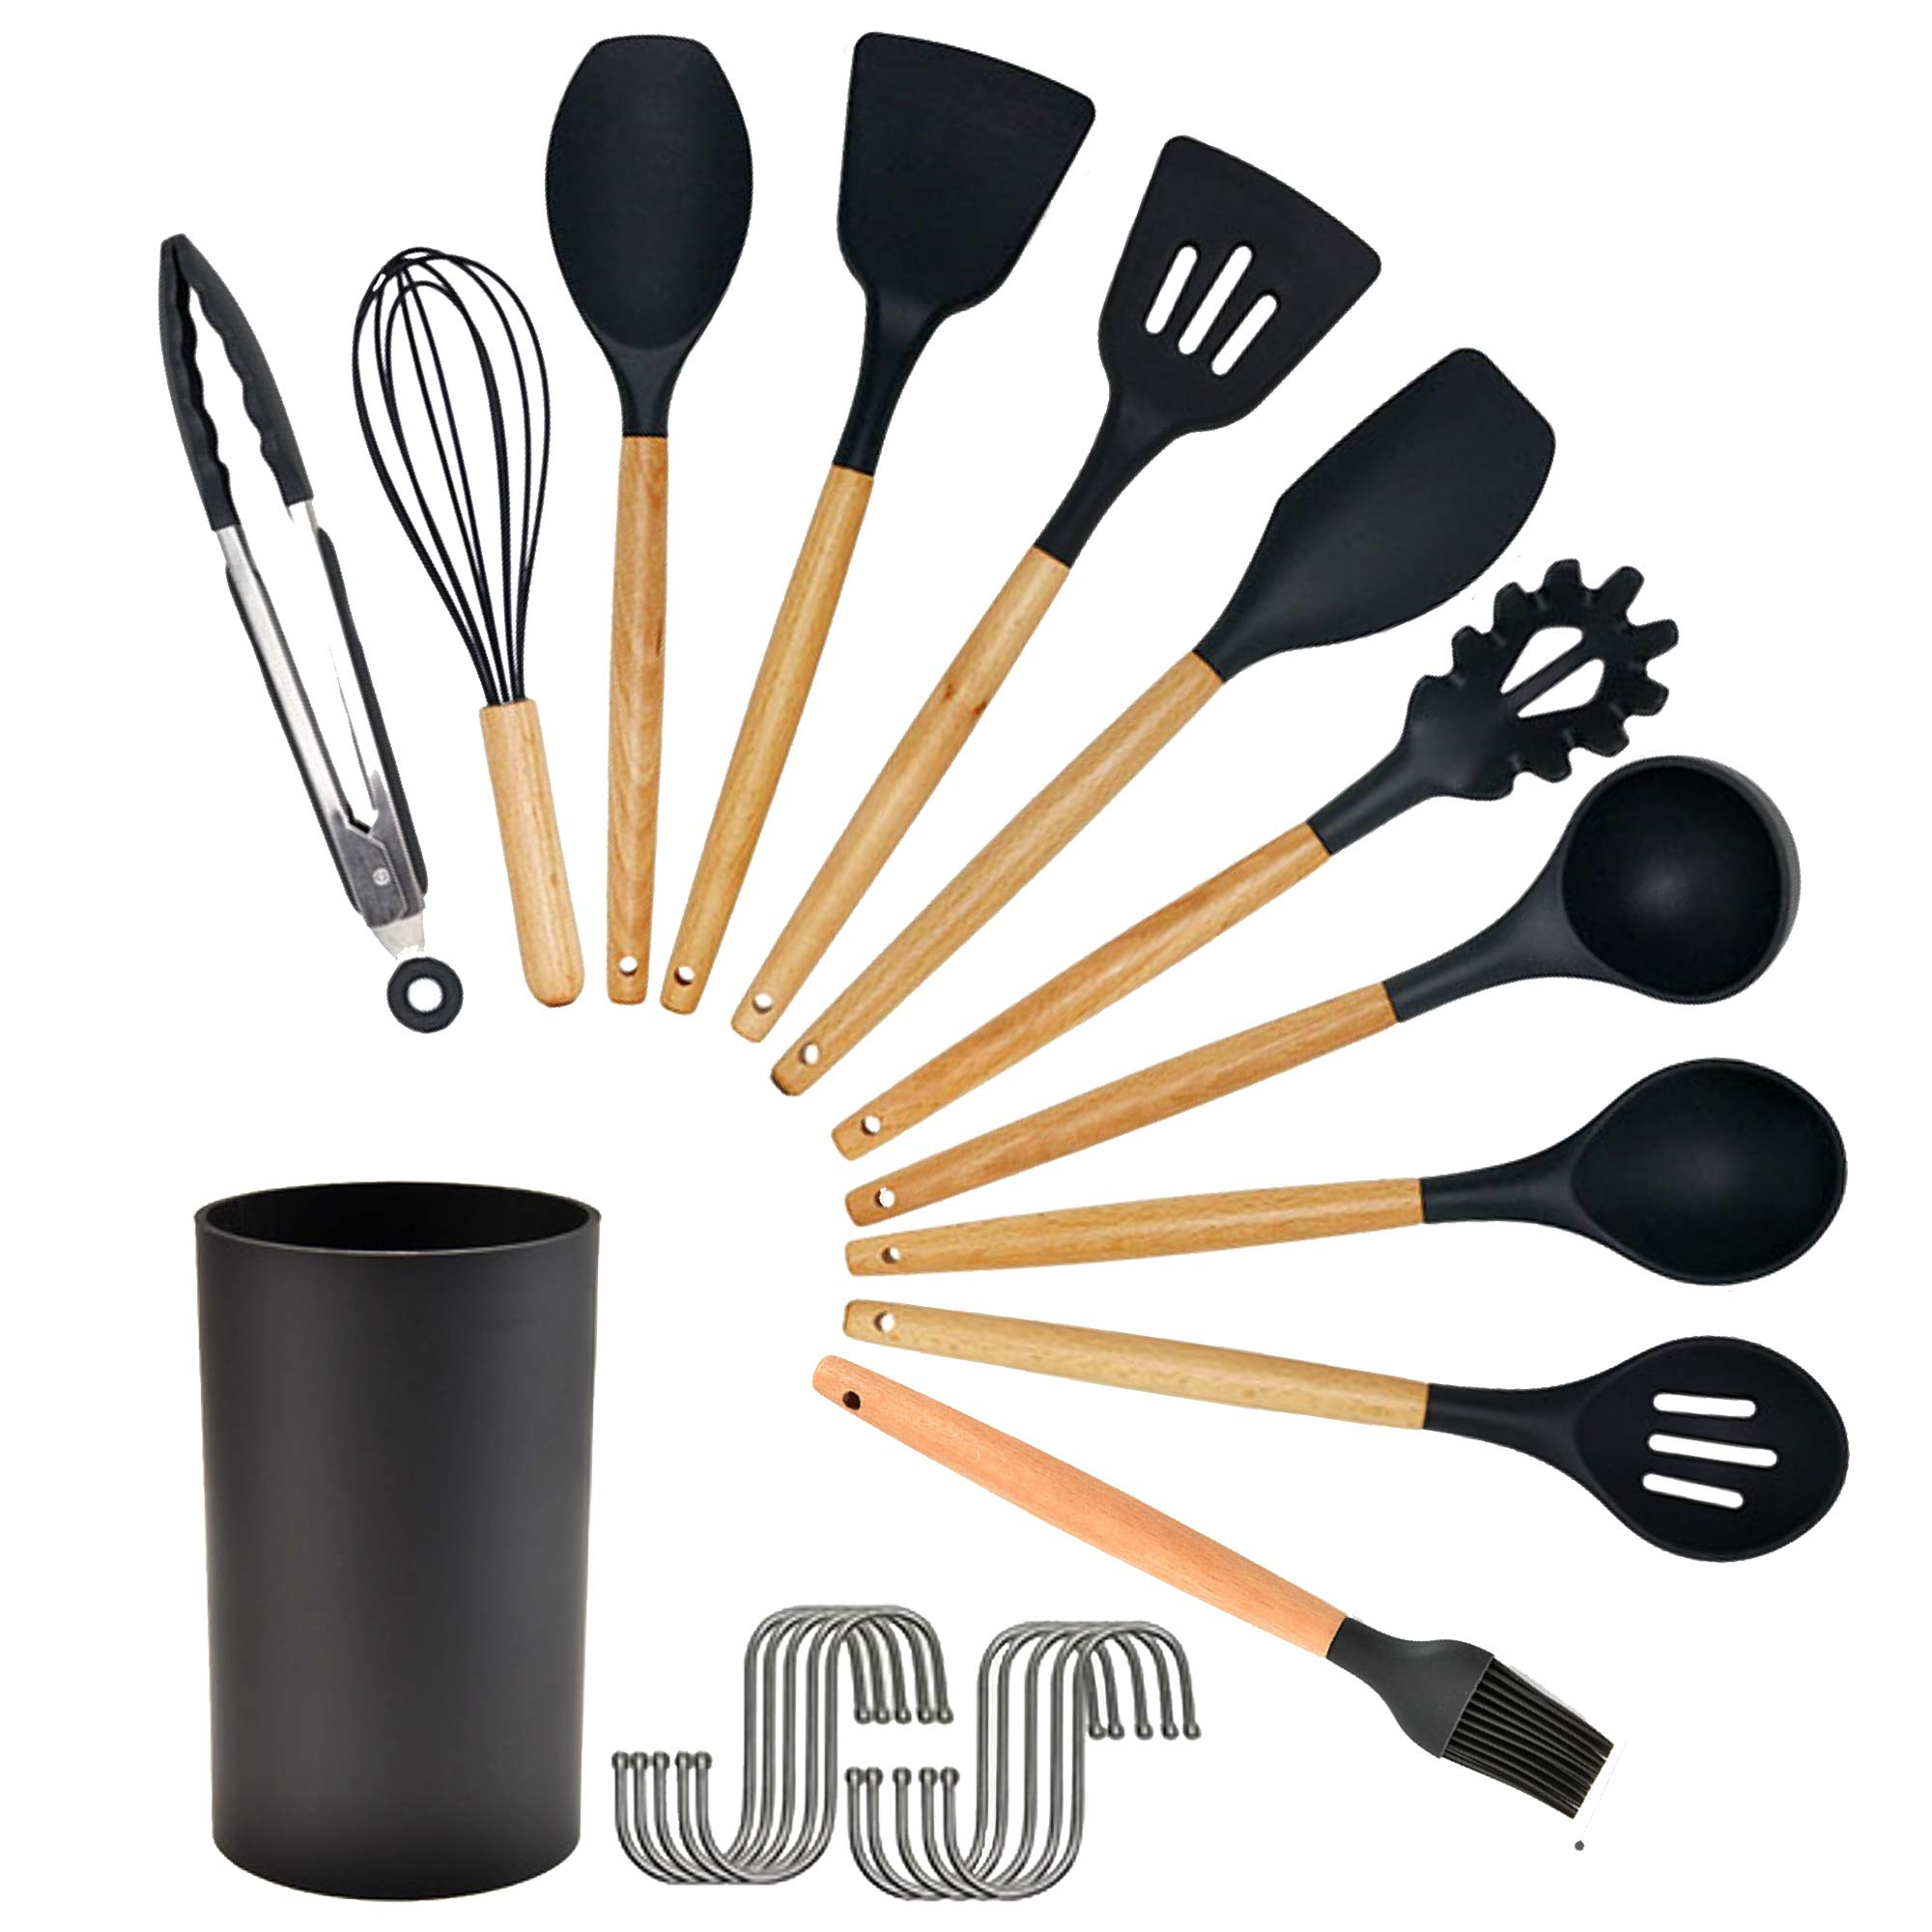 12pcs Silicone Cooking Kitchen Utensils Set with Holder Wooden Handles Kitchen Gadgets